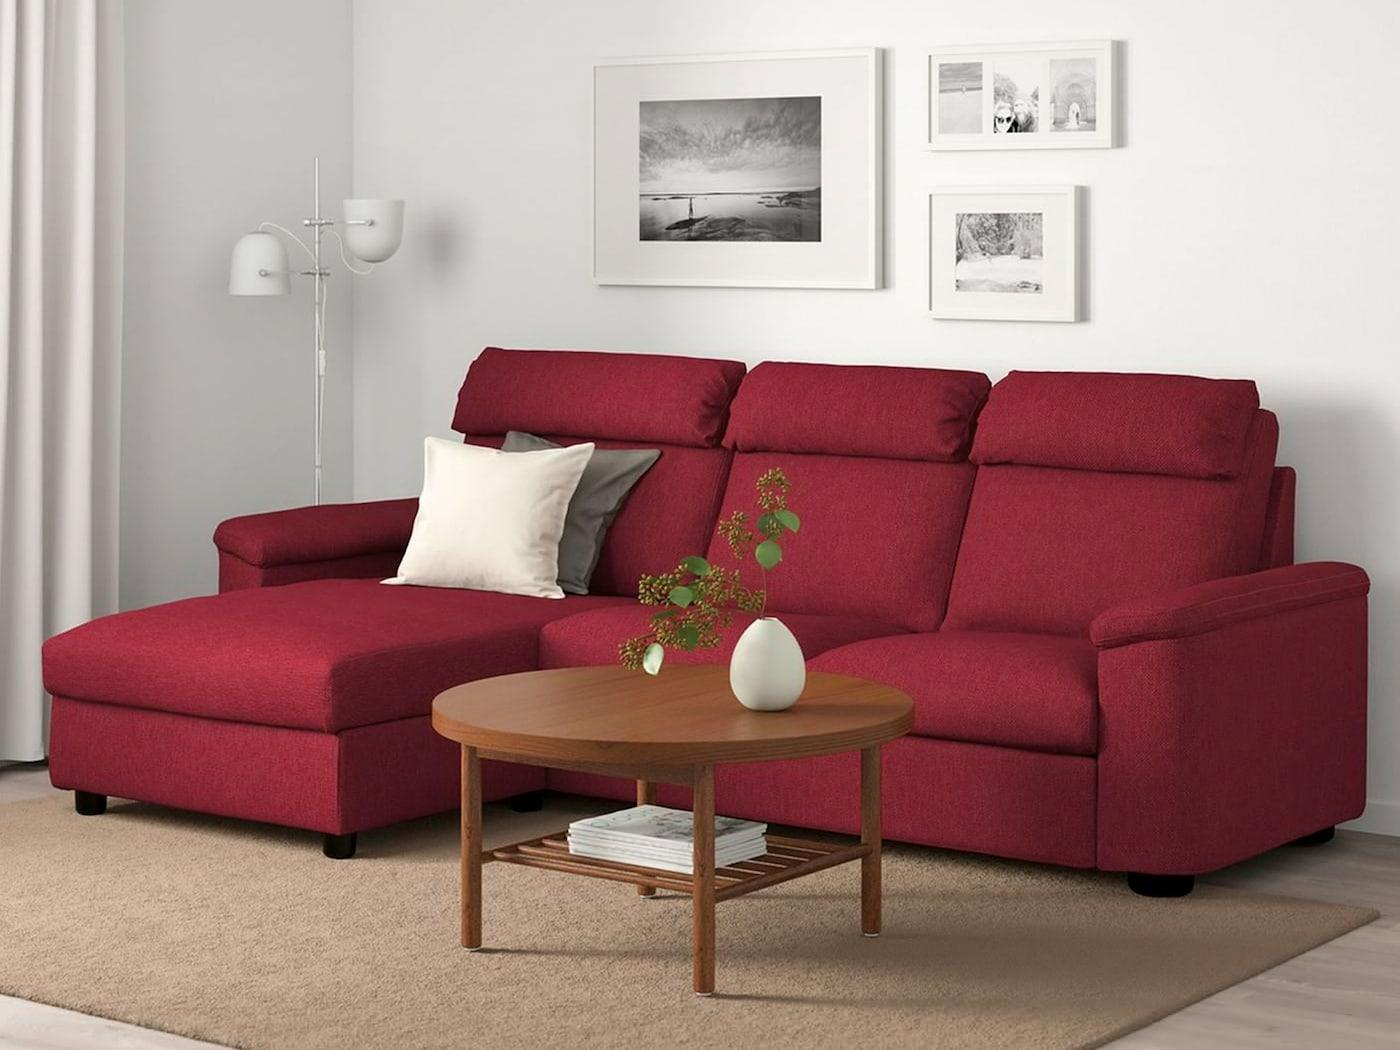 Design your own sofa